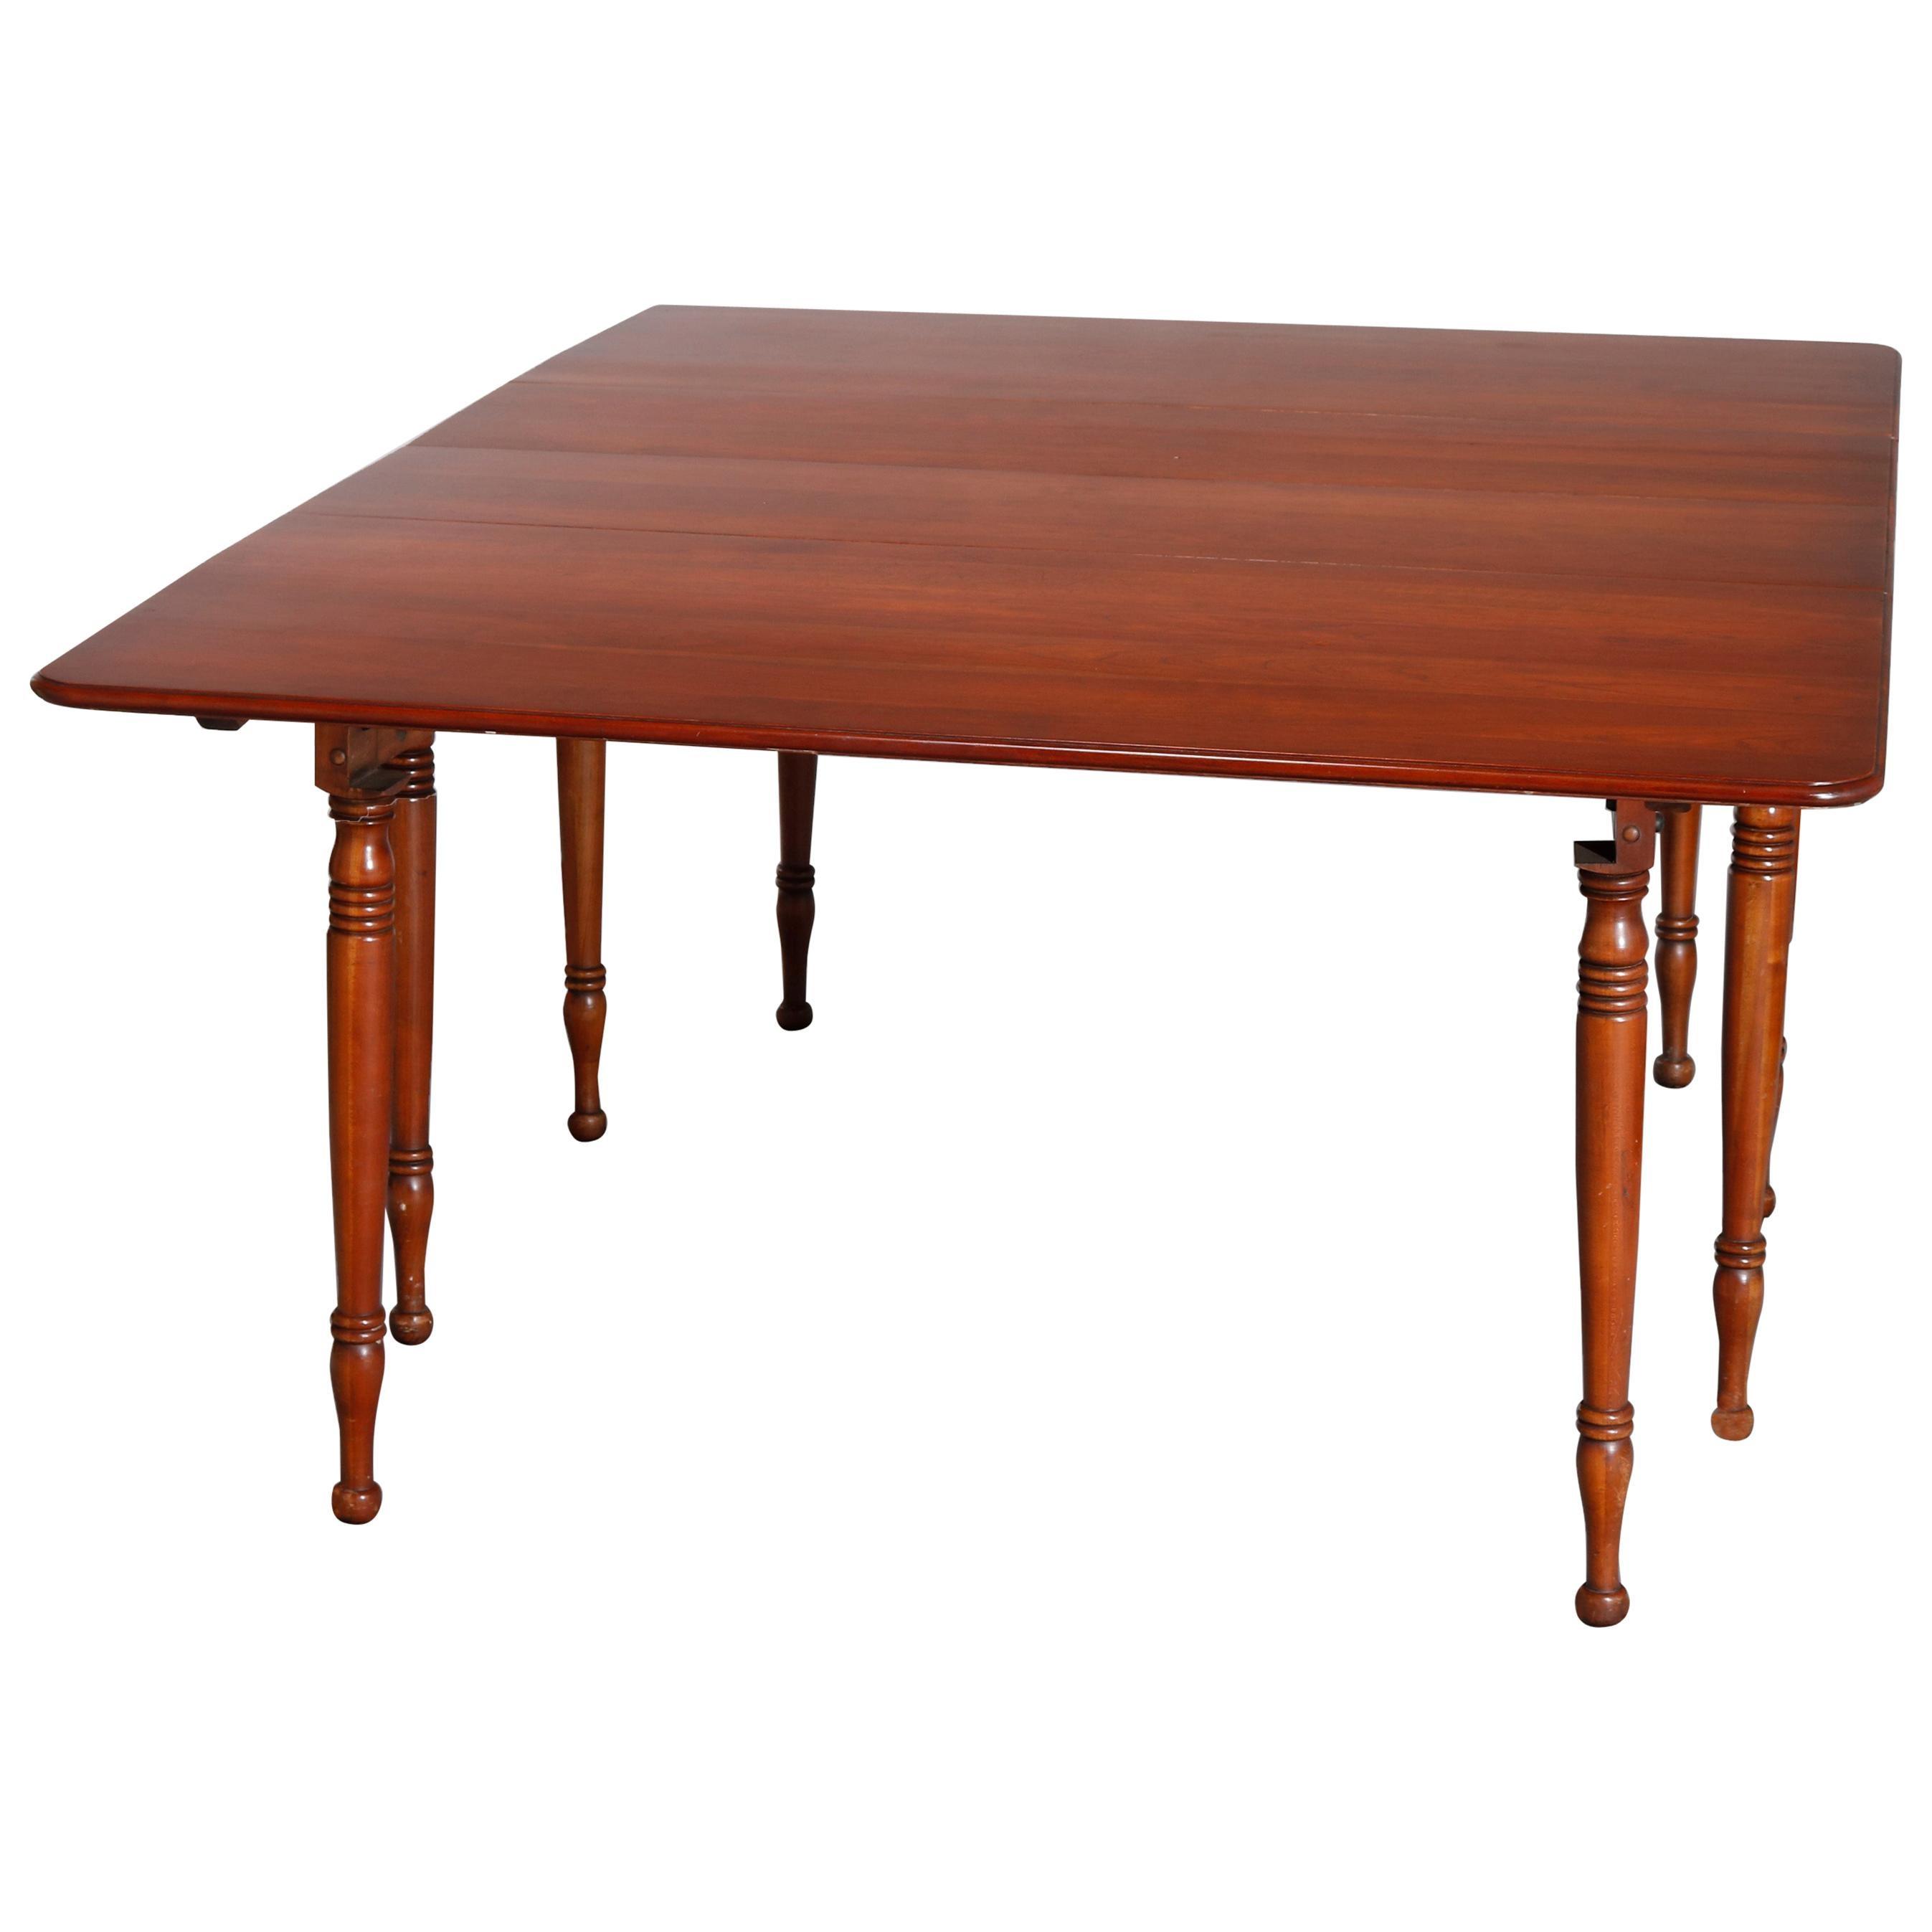 Vintage Sheraton Pennsylvania House Cherry Drop-Leaf Extension Dining Table